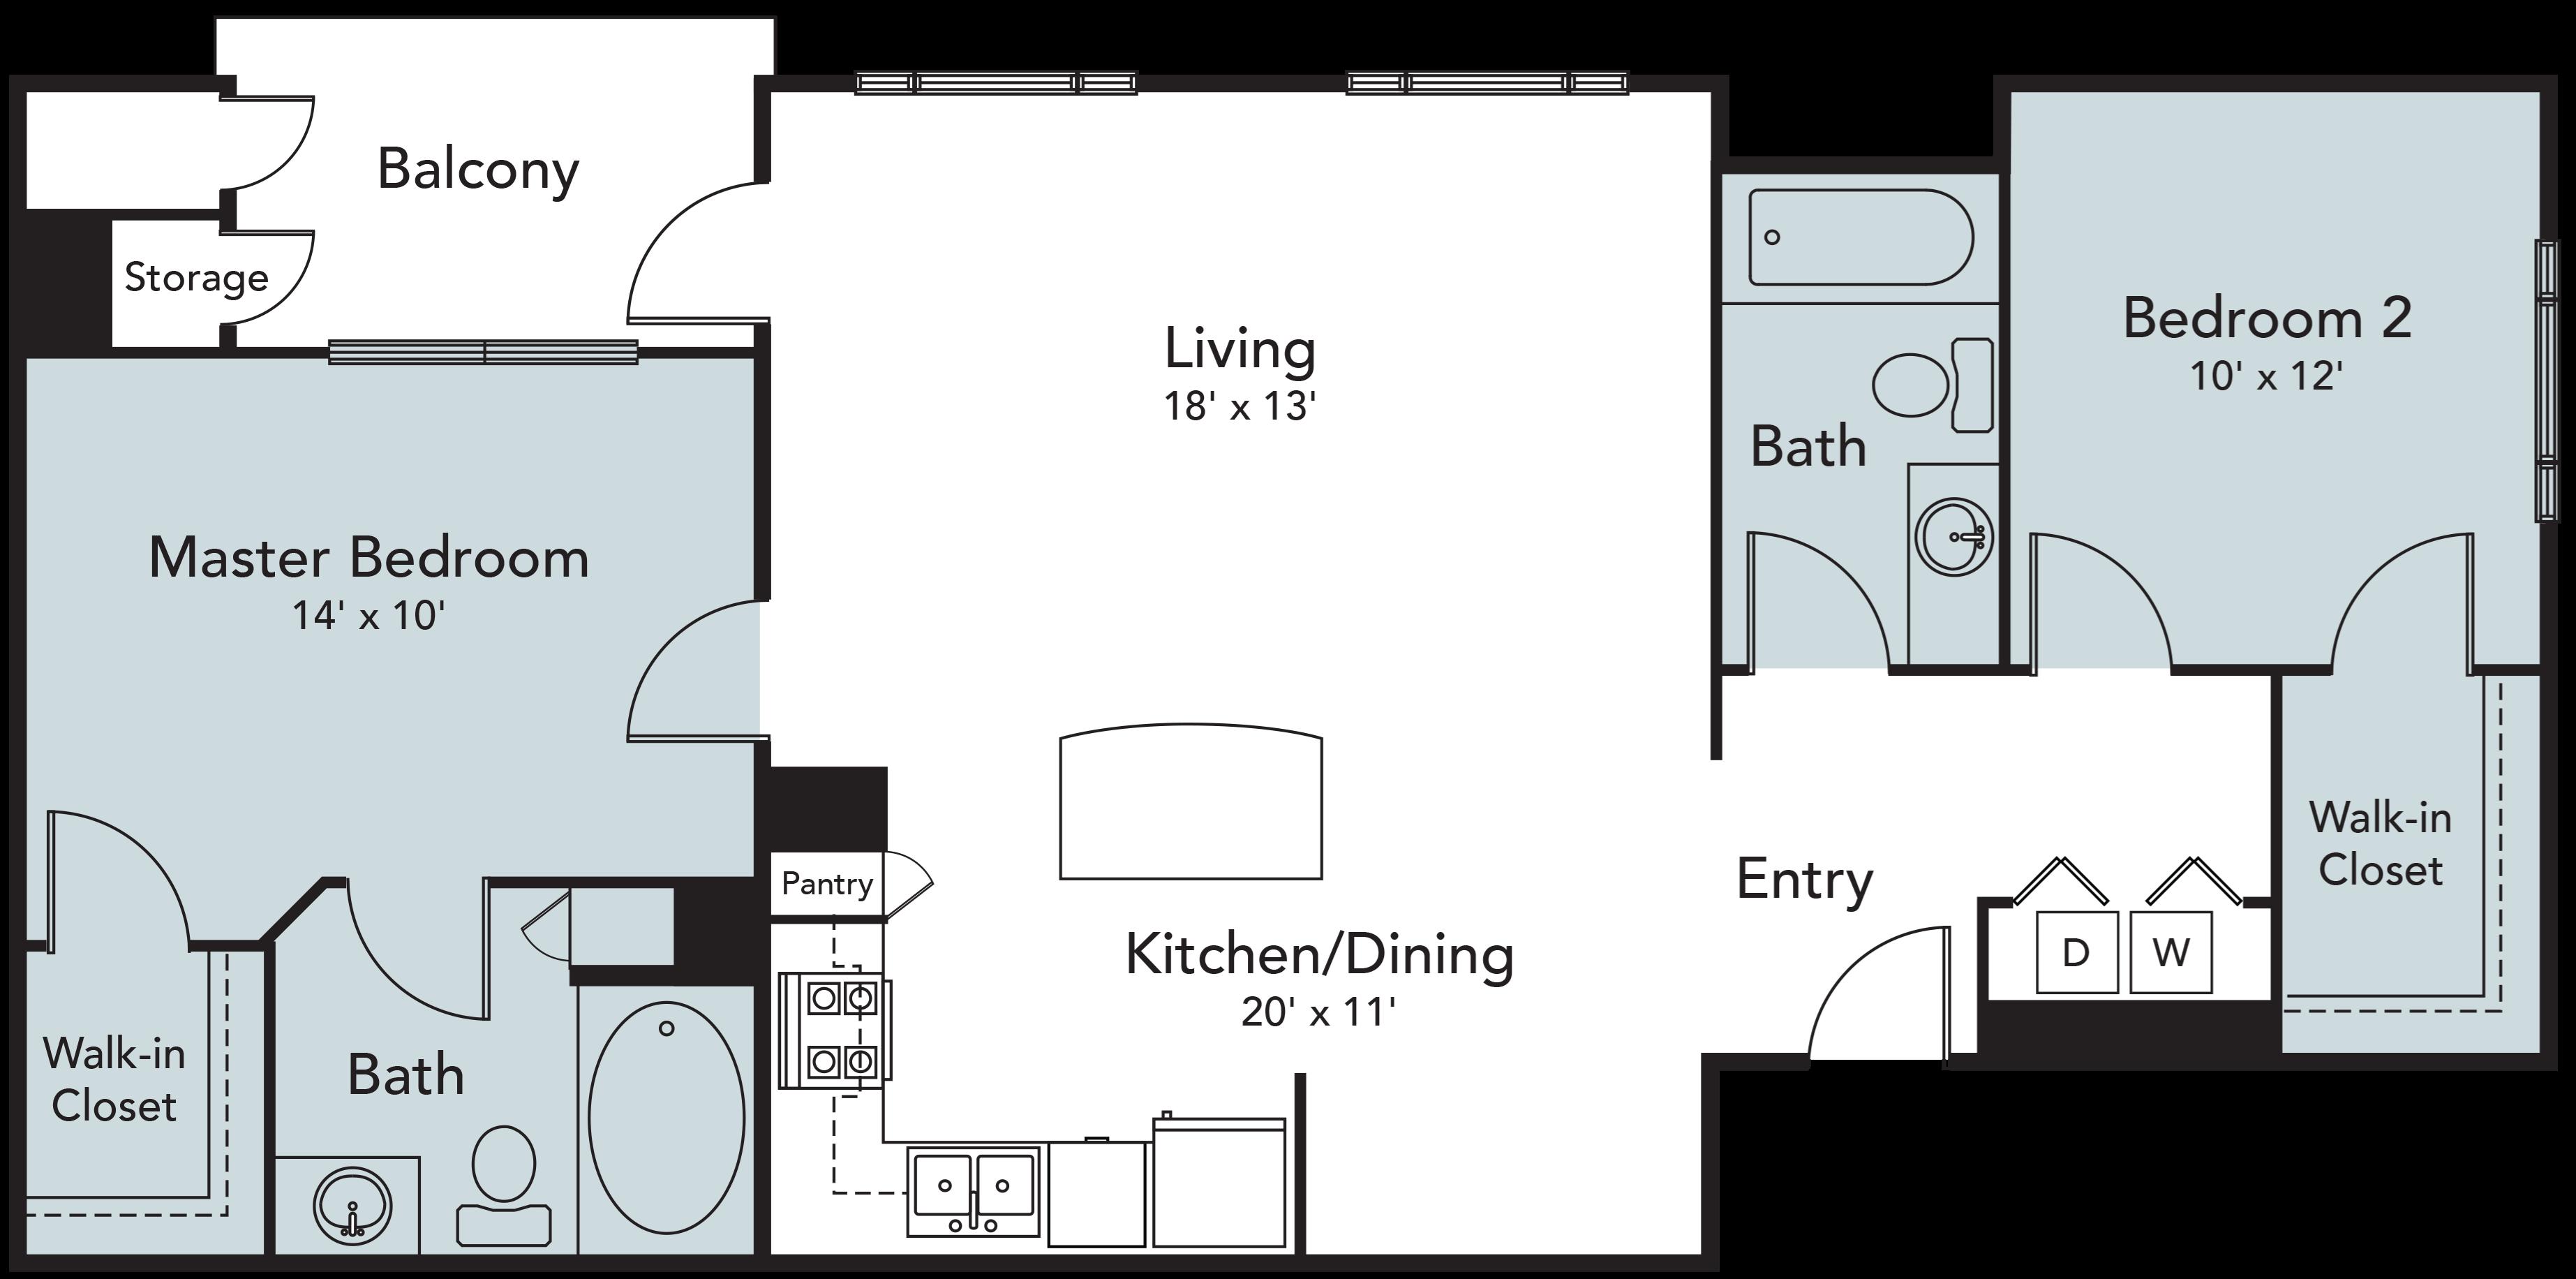 floor plans of costa rialto in houston tx floor plans of costa rialto in houston tx